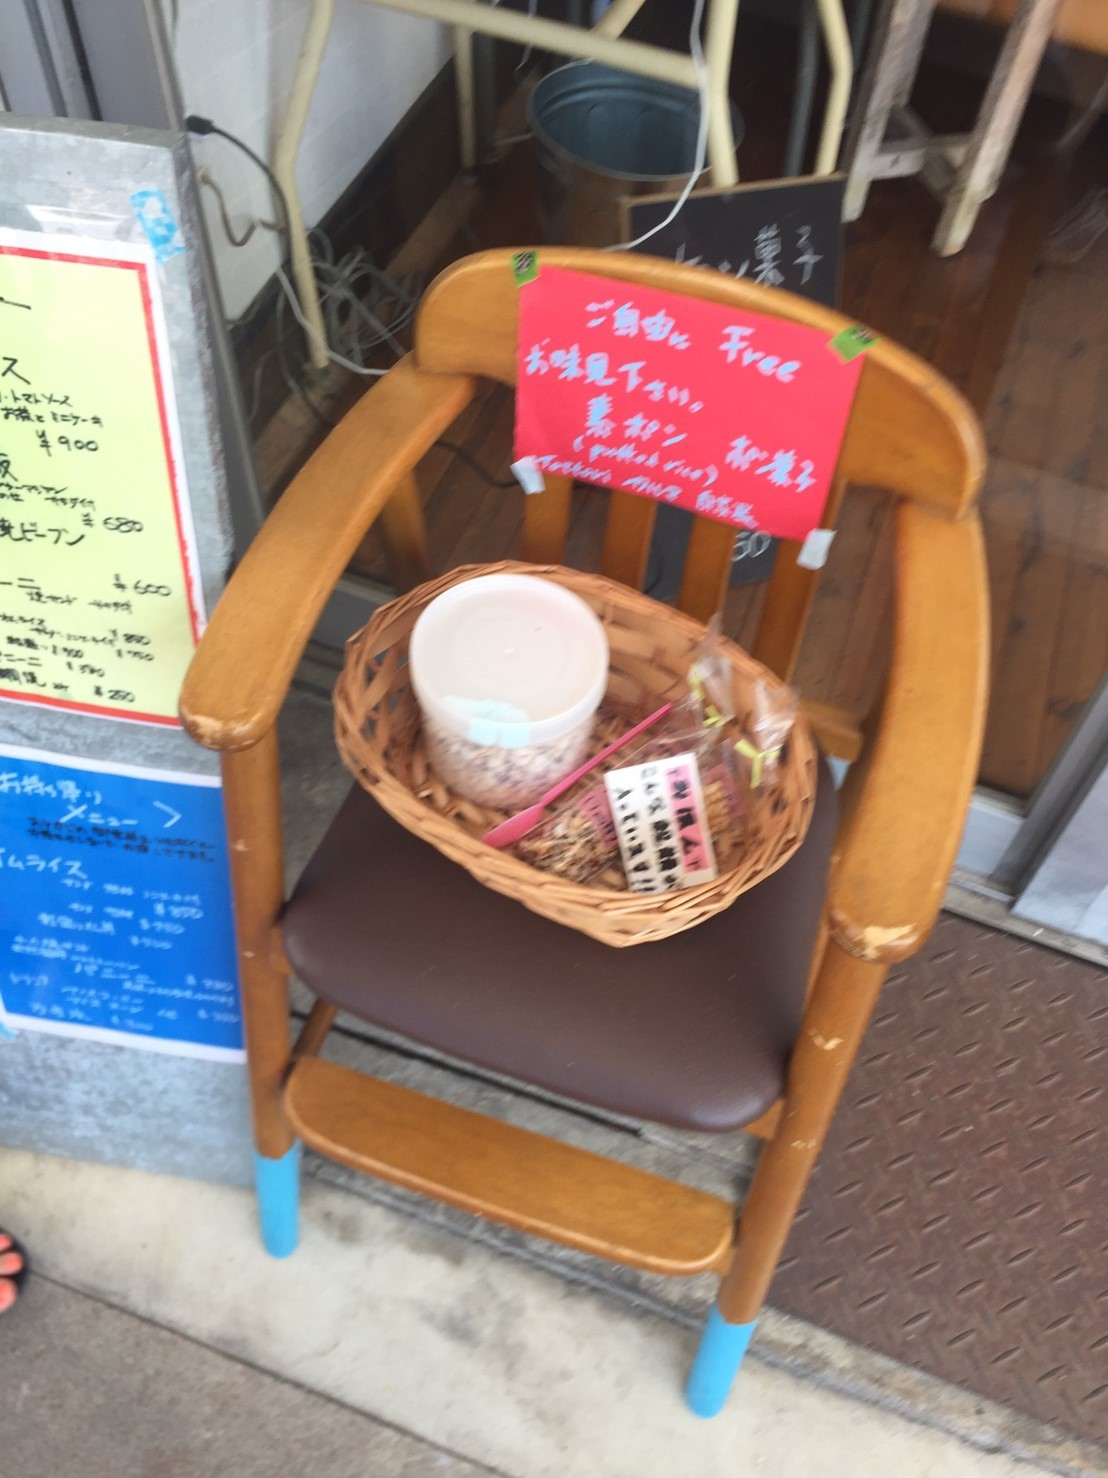 Tottori カルマ  カルマ焼飯_e0115904_22012255.jpg